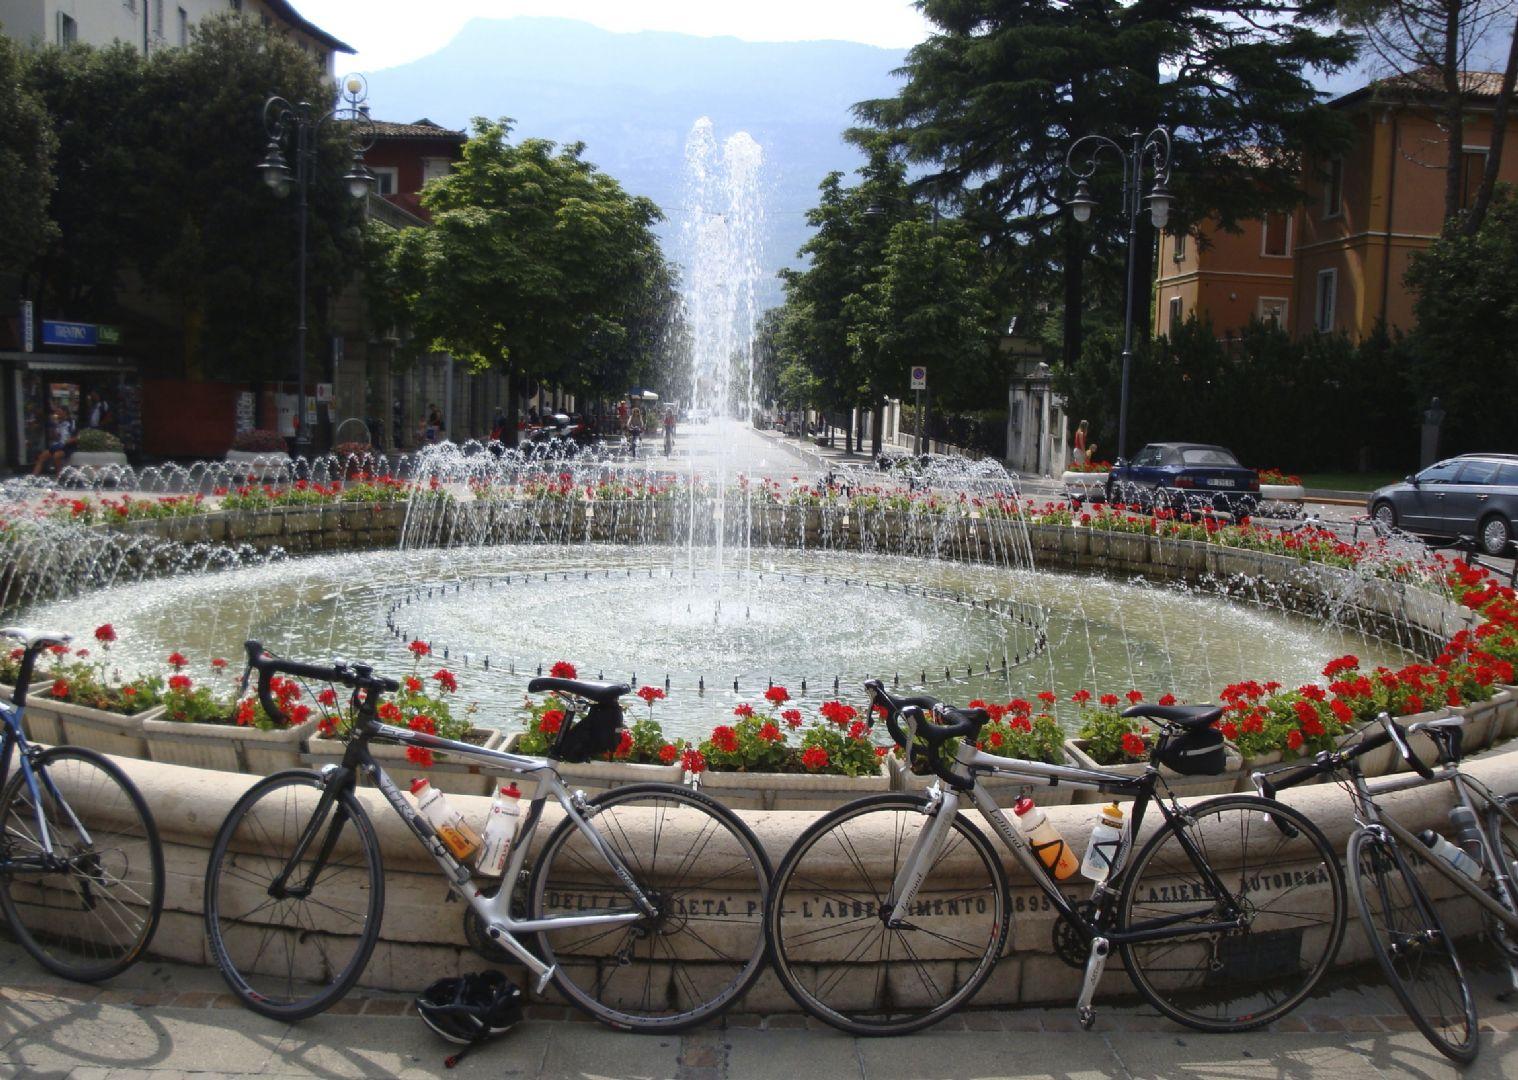 DolomitesRoadCycling123.jpg - Italy - Raid Dolomiti - Guided Road Cycling Holiday - Road Cycling